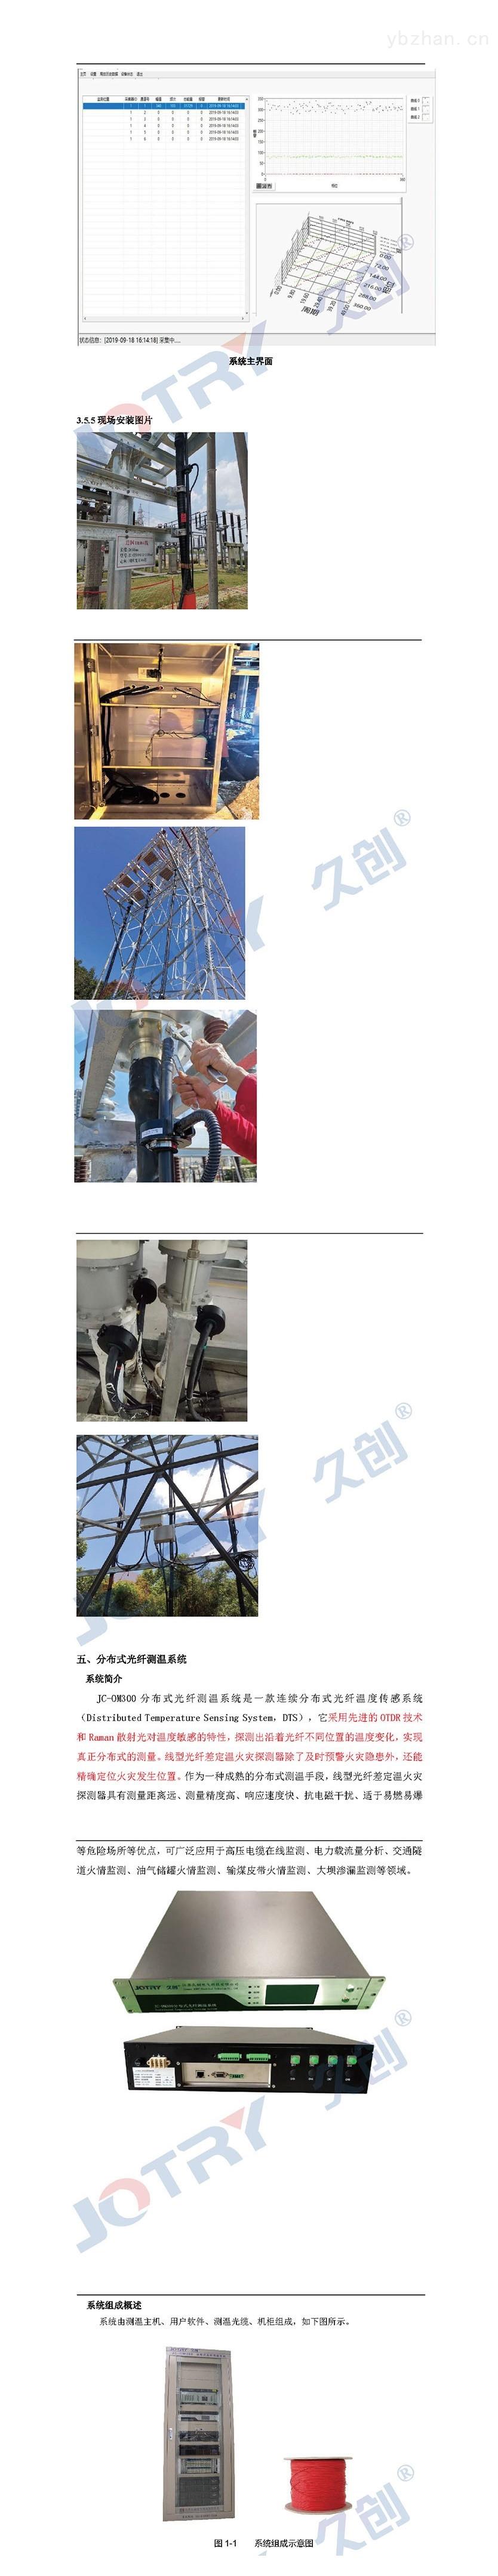 <strong>电缆隧道综合监控系统</strong>02-恢复的03.jpg